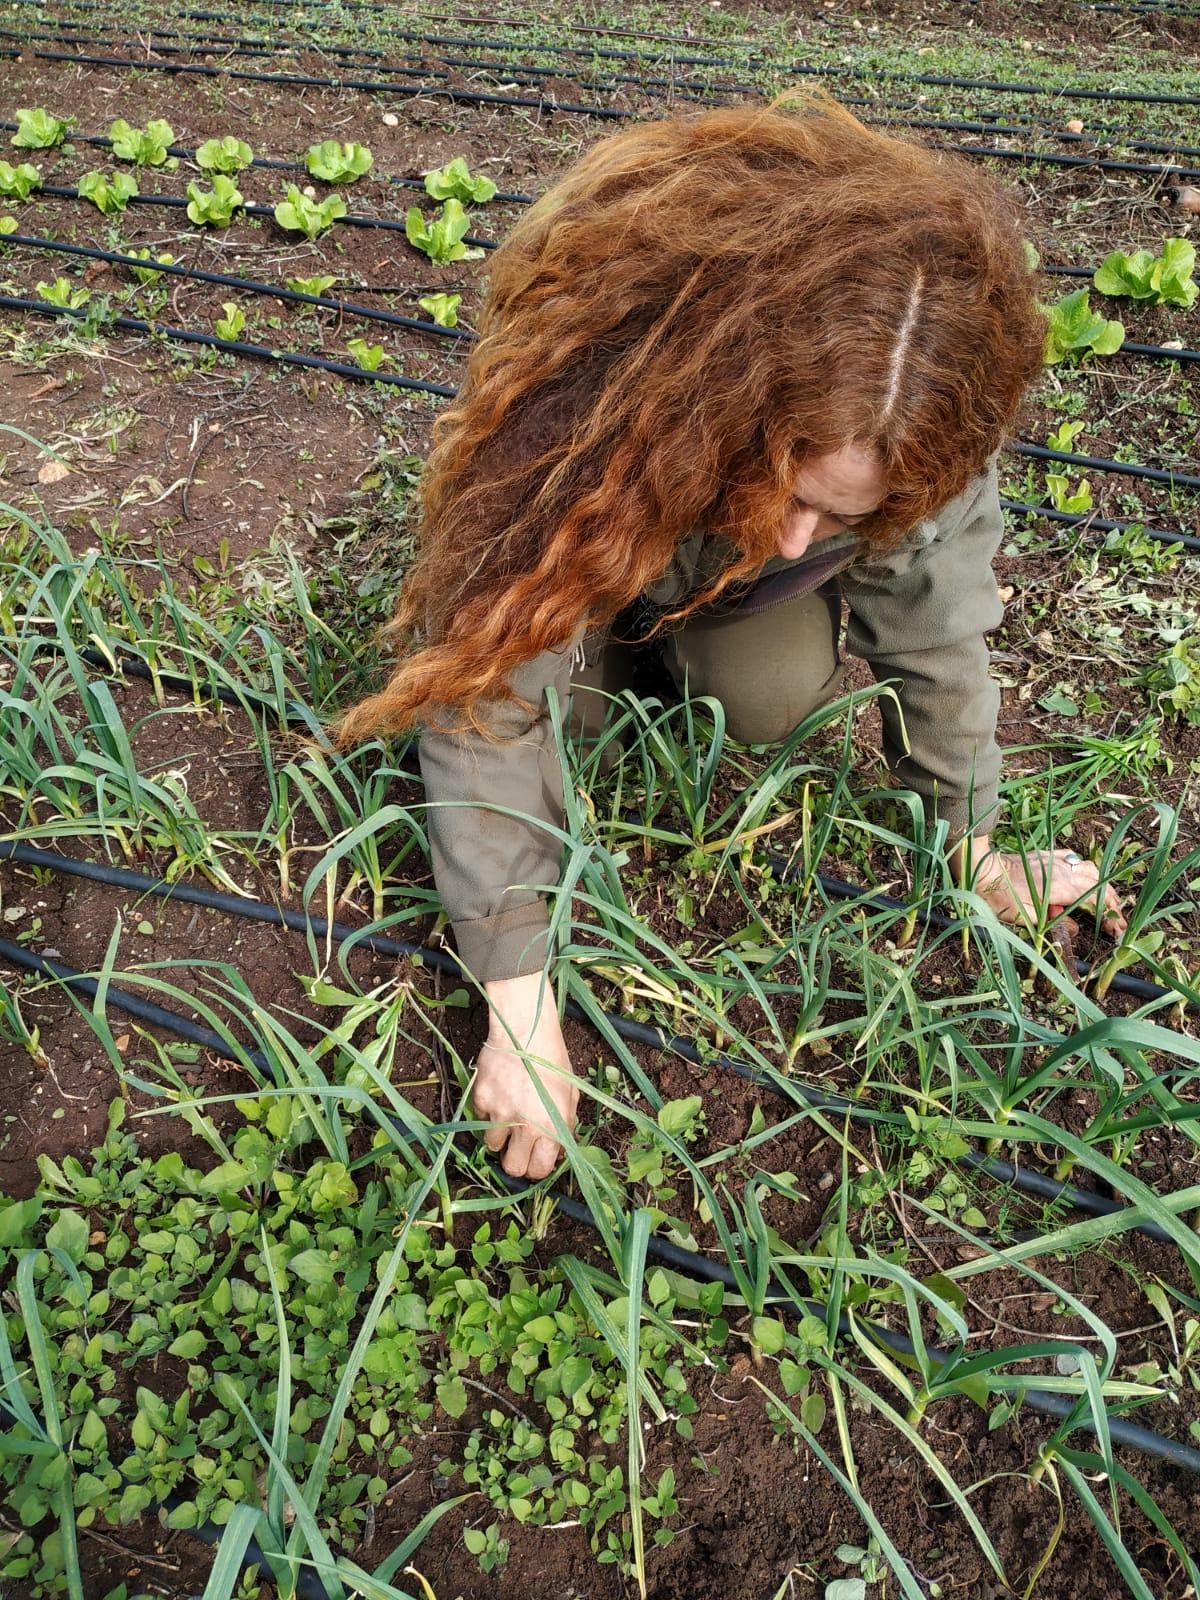 Orna weeding